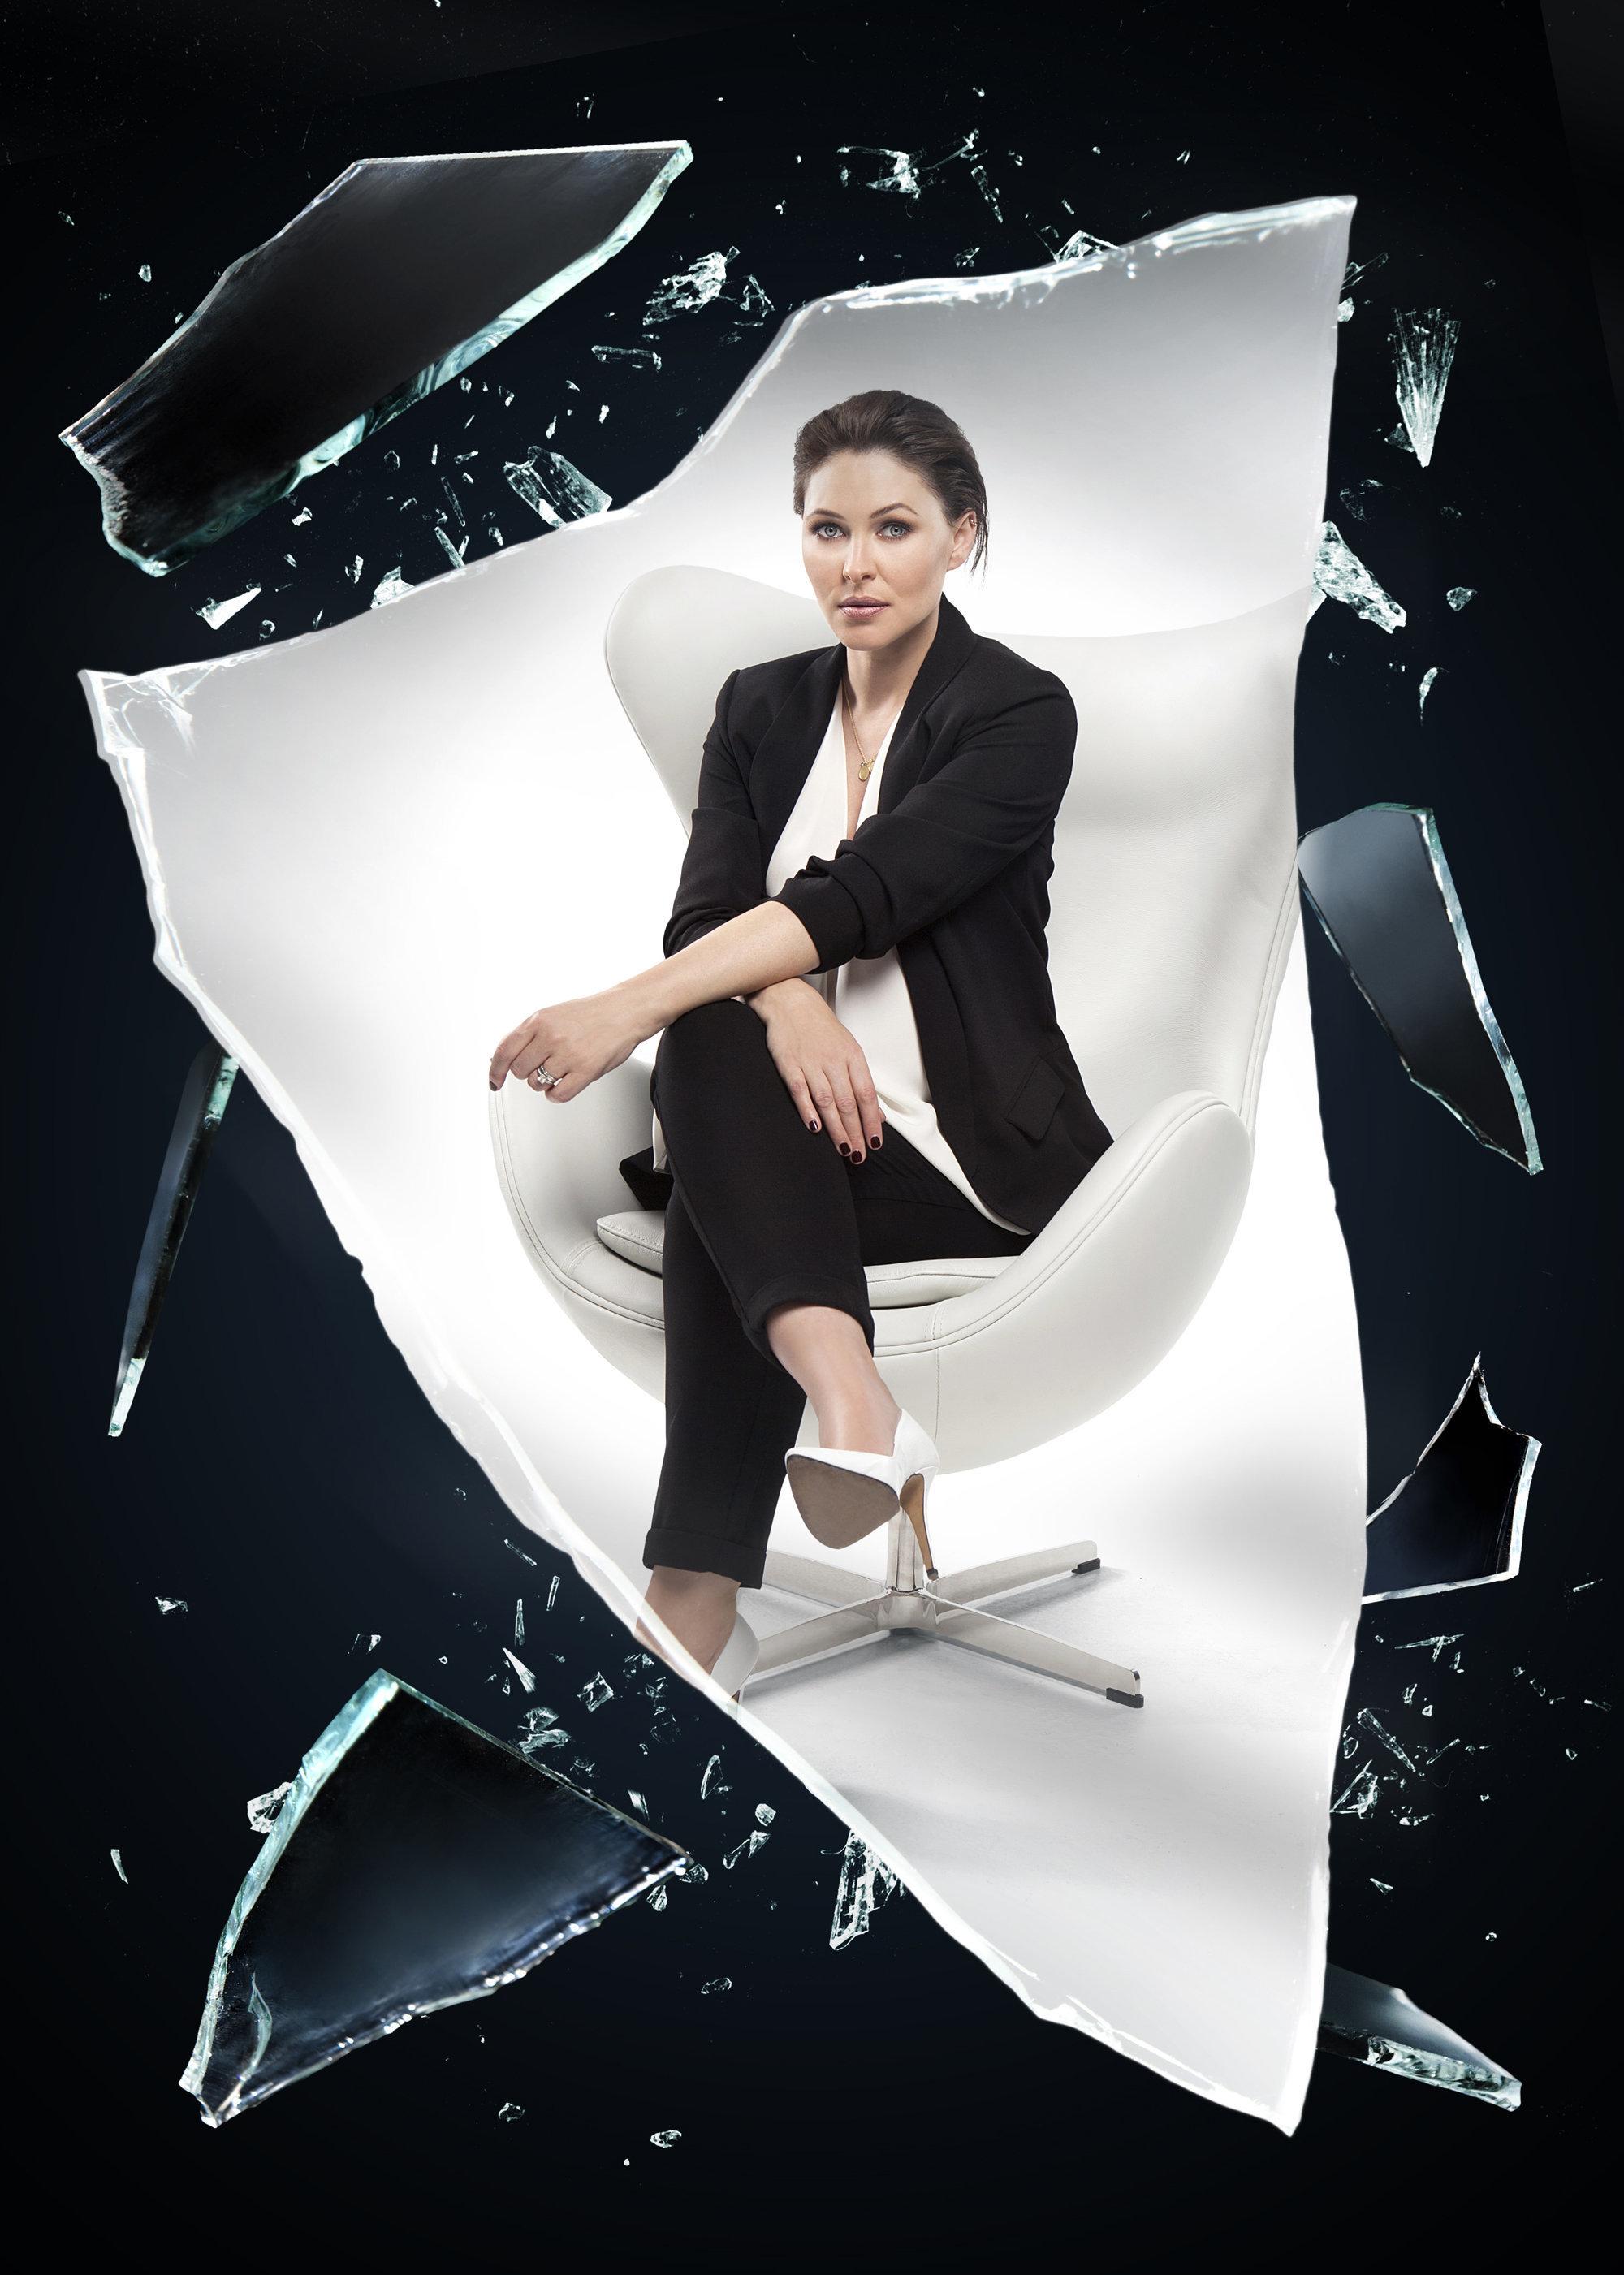 Emma Willis will return as the host of 'Big